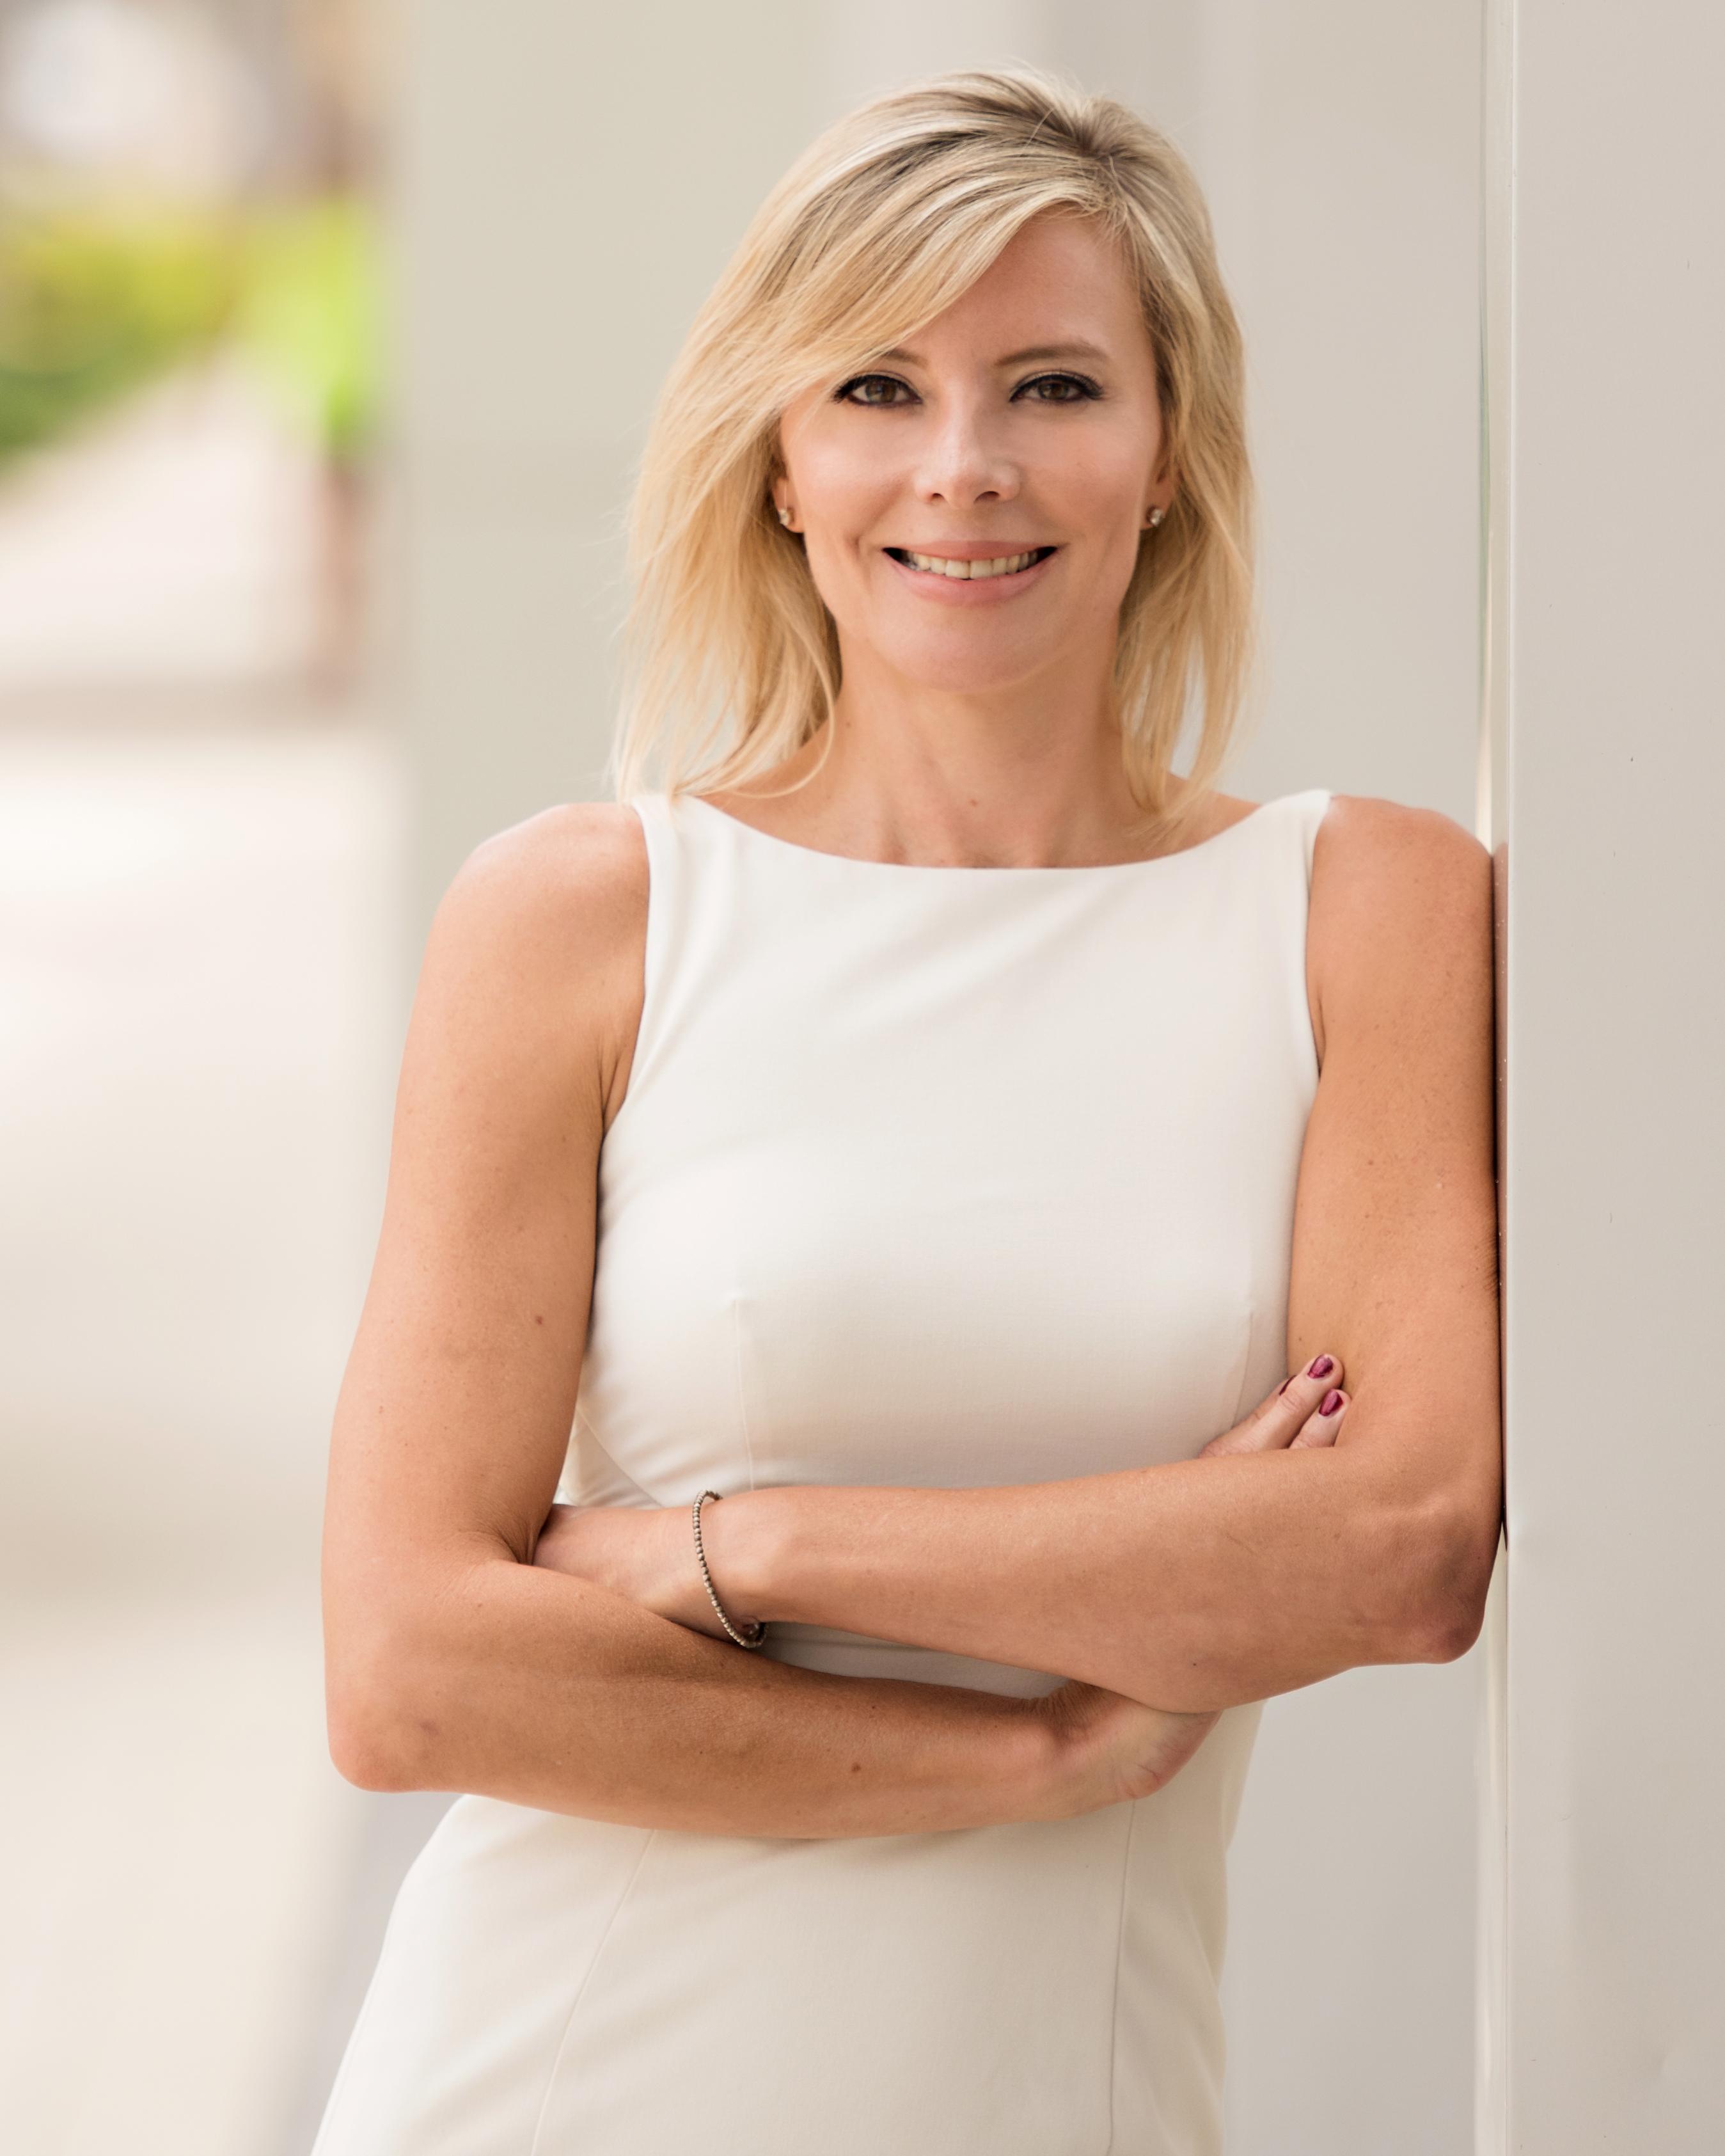 Christine Perrin Stocco